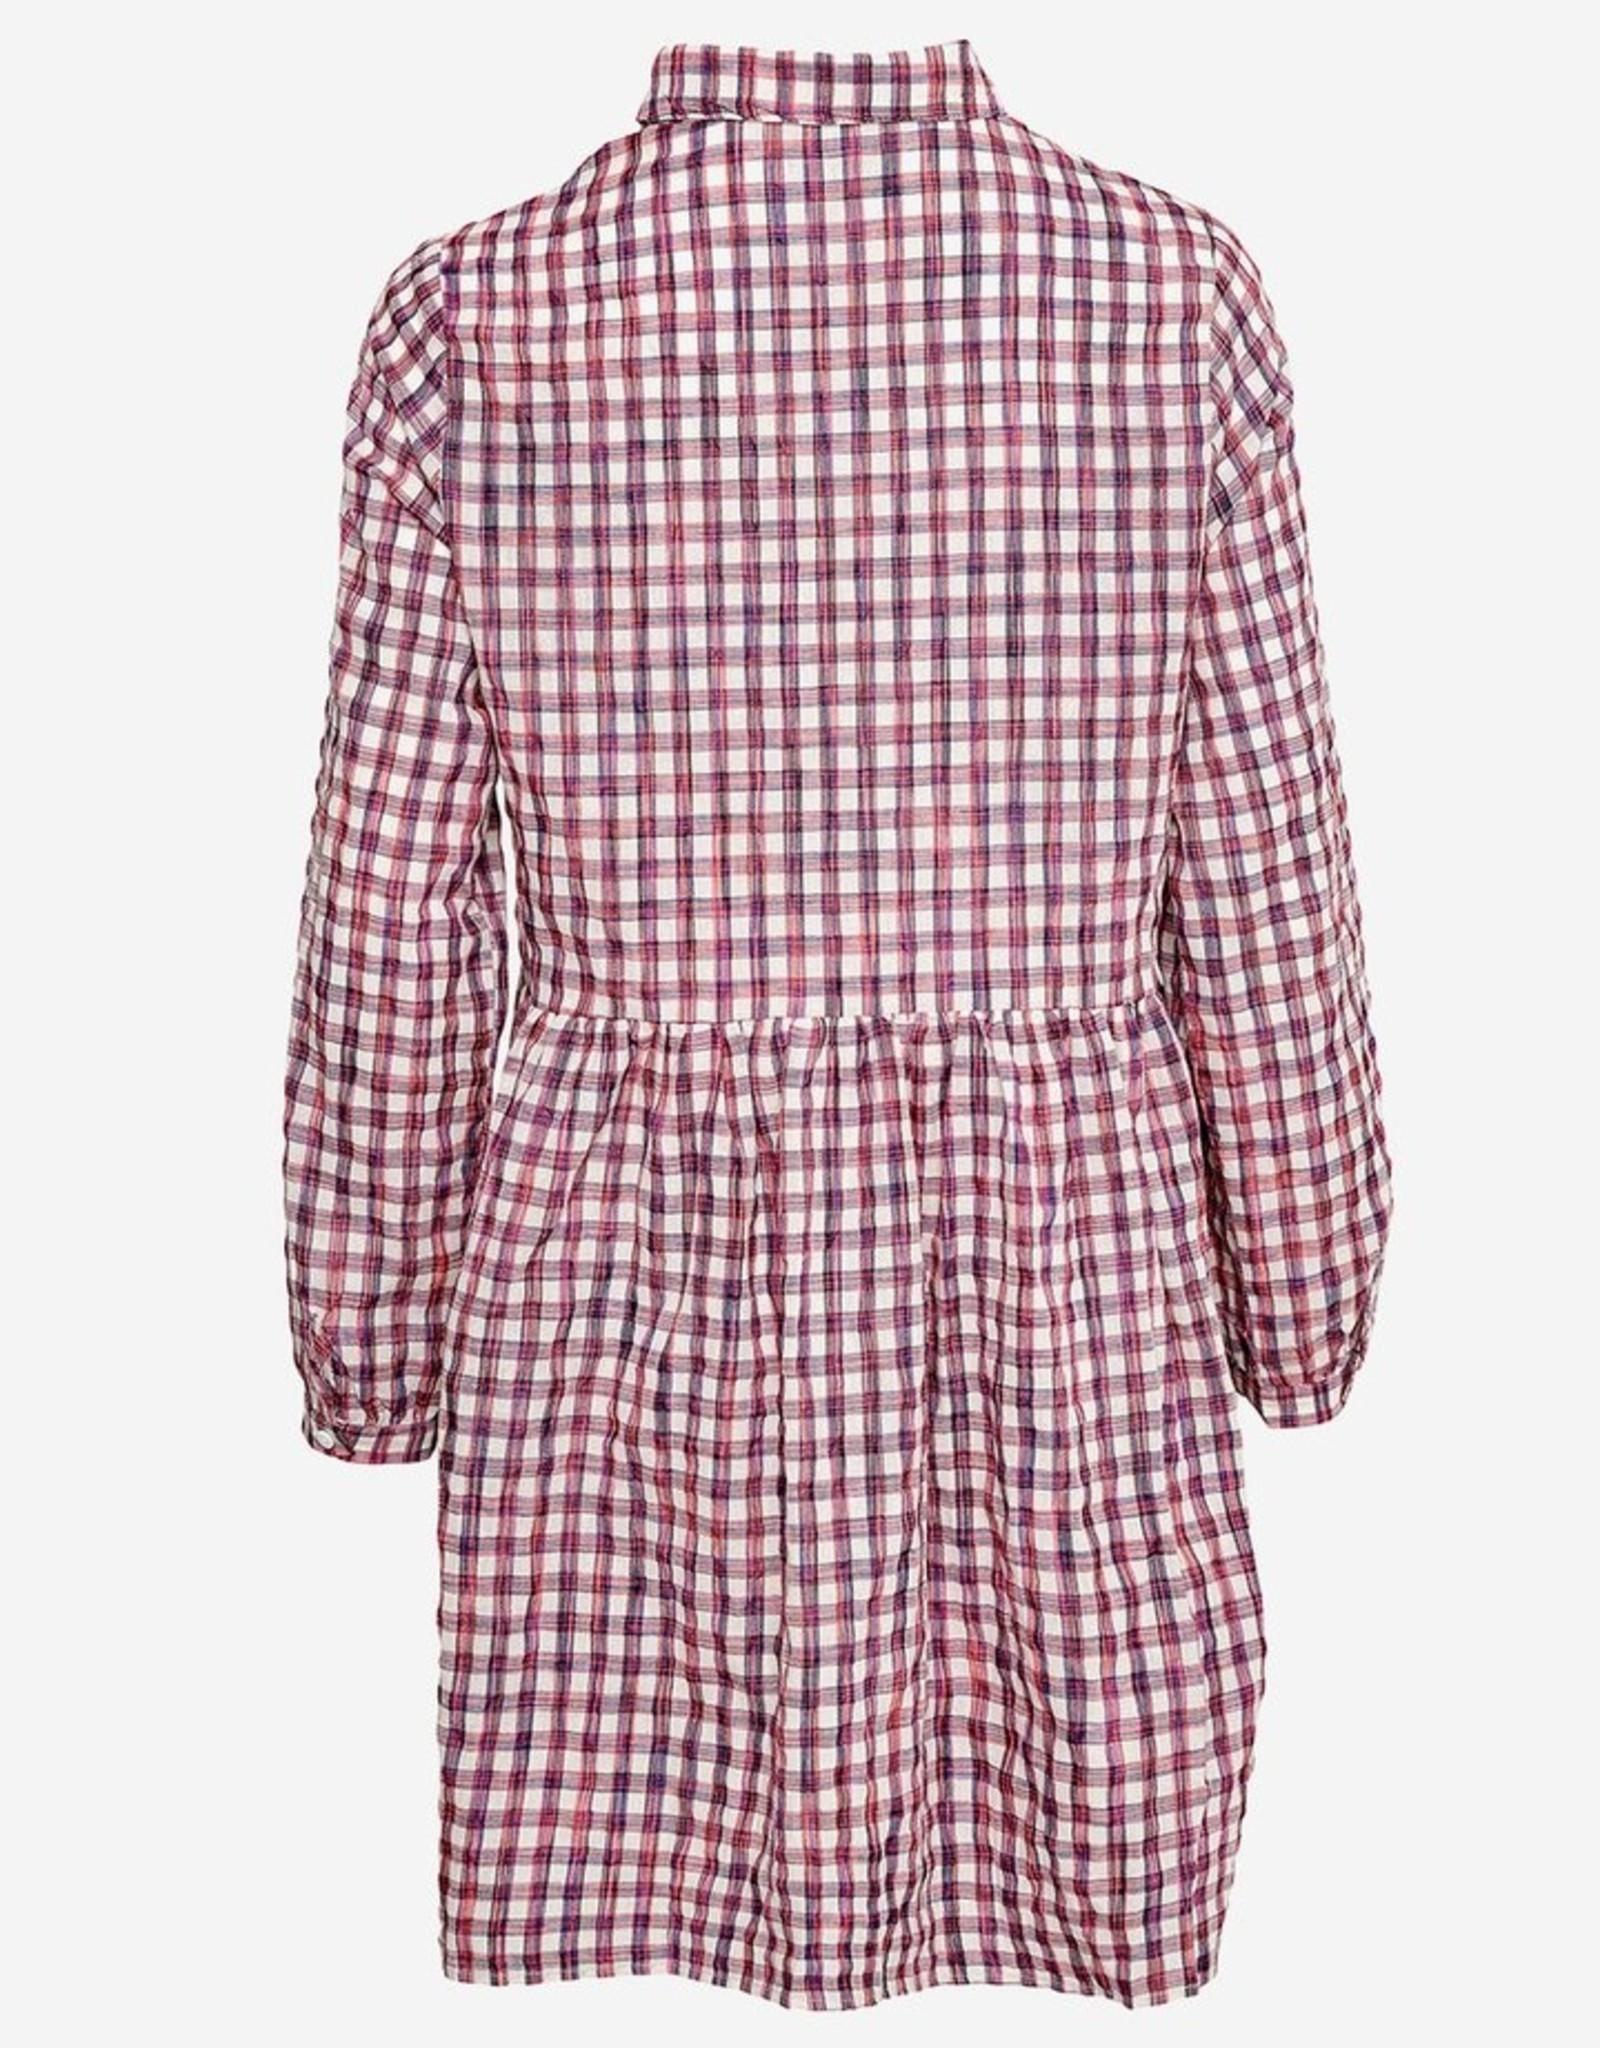 Vora Dress